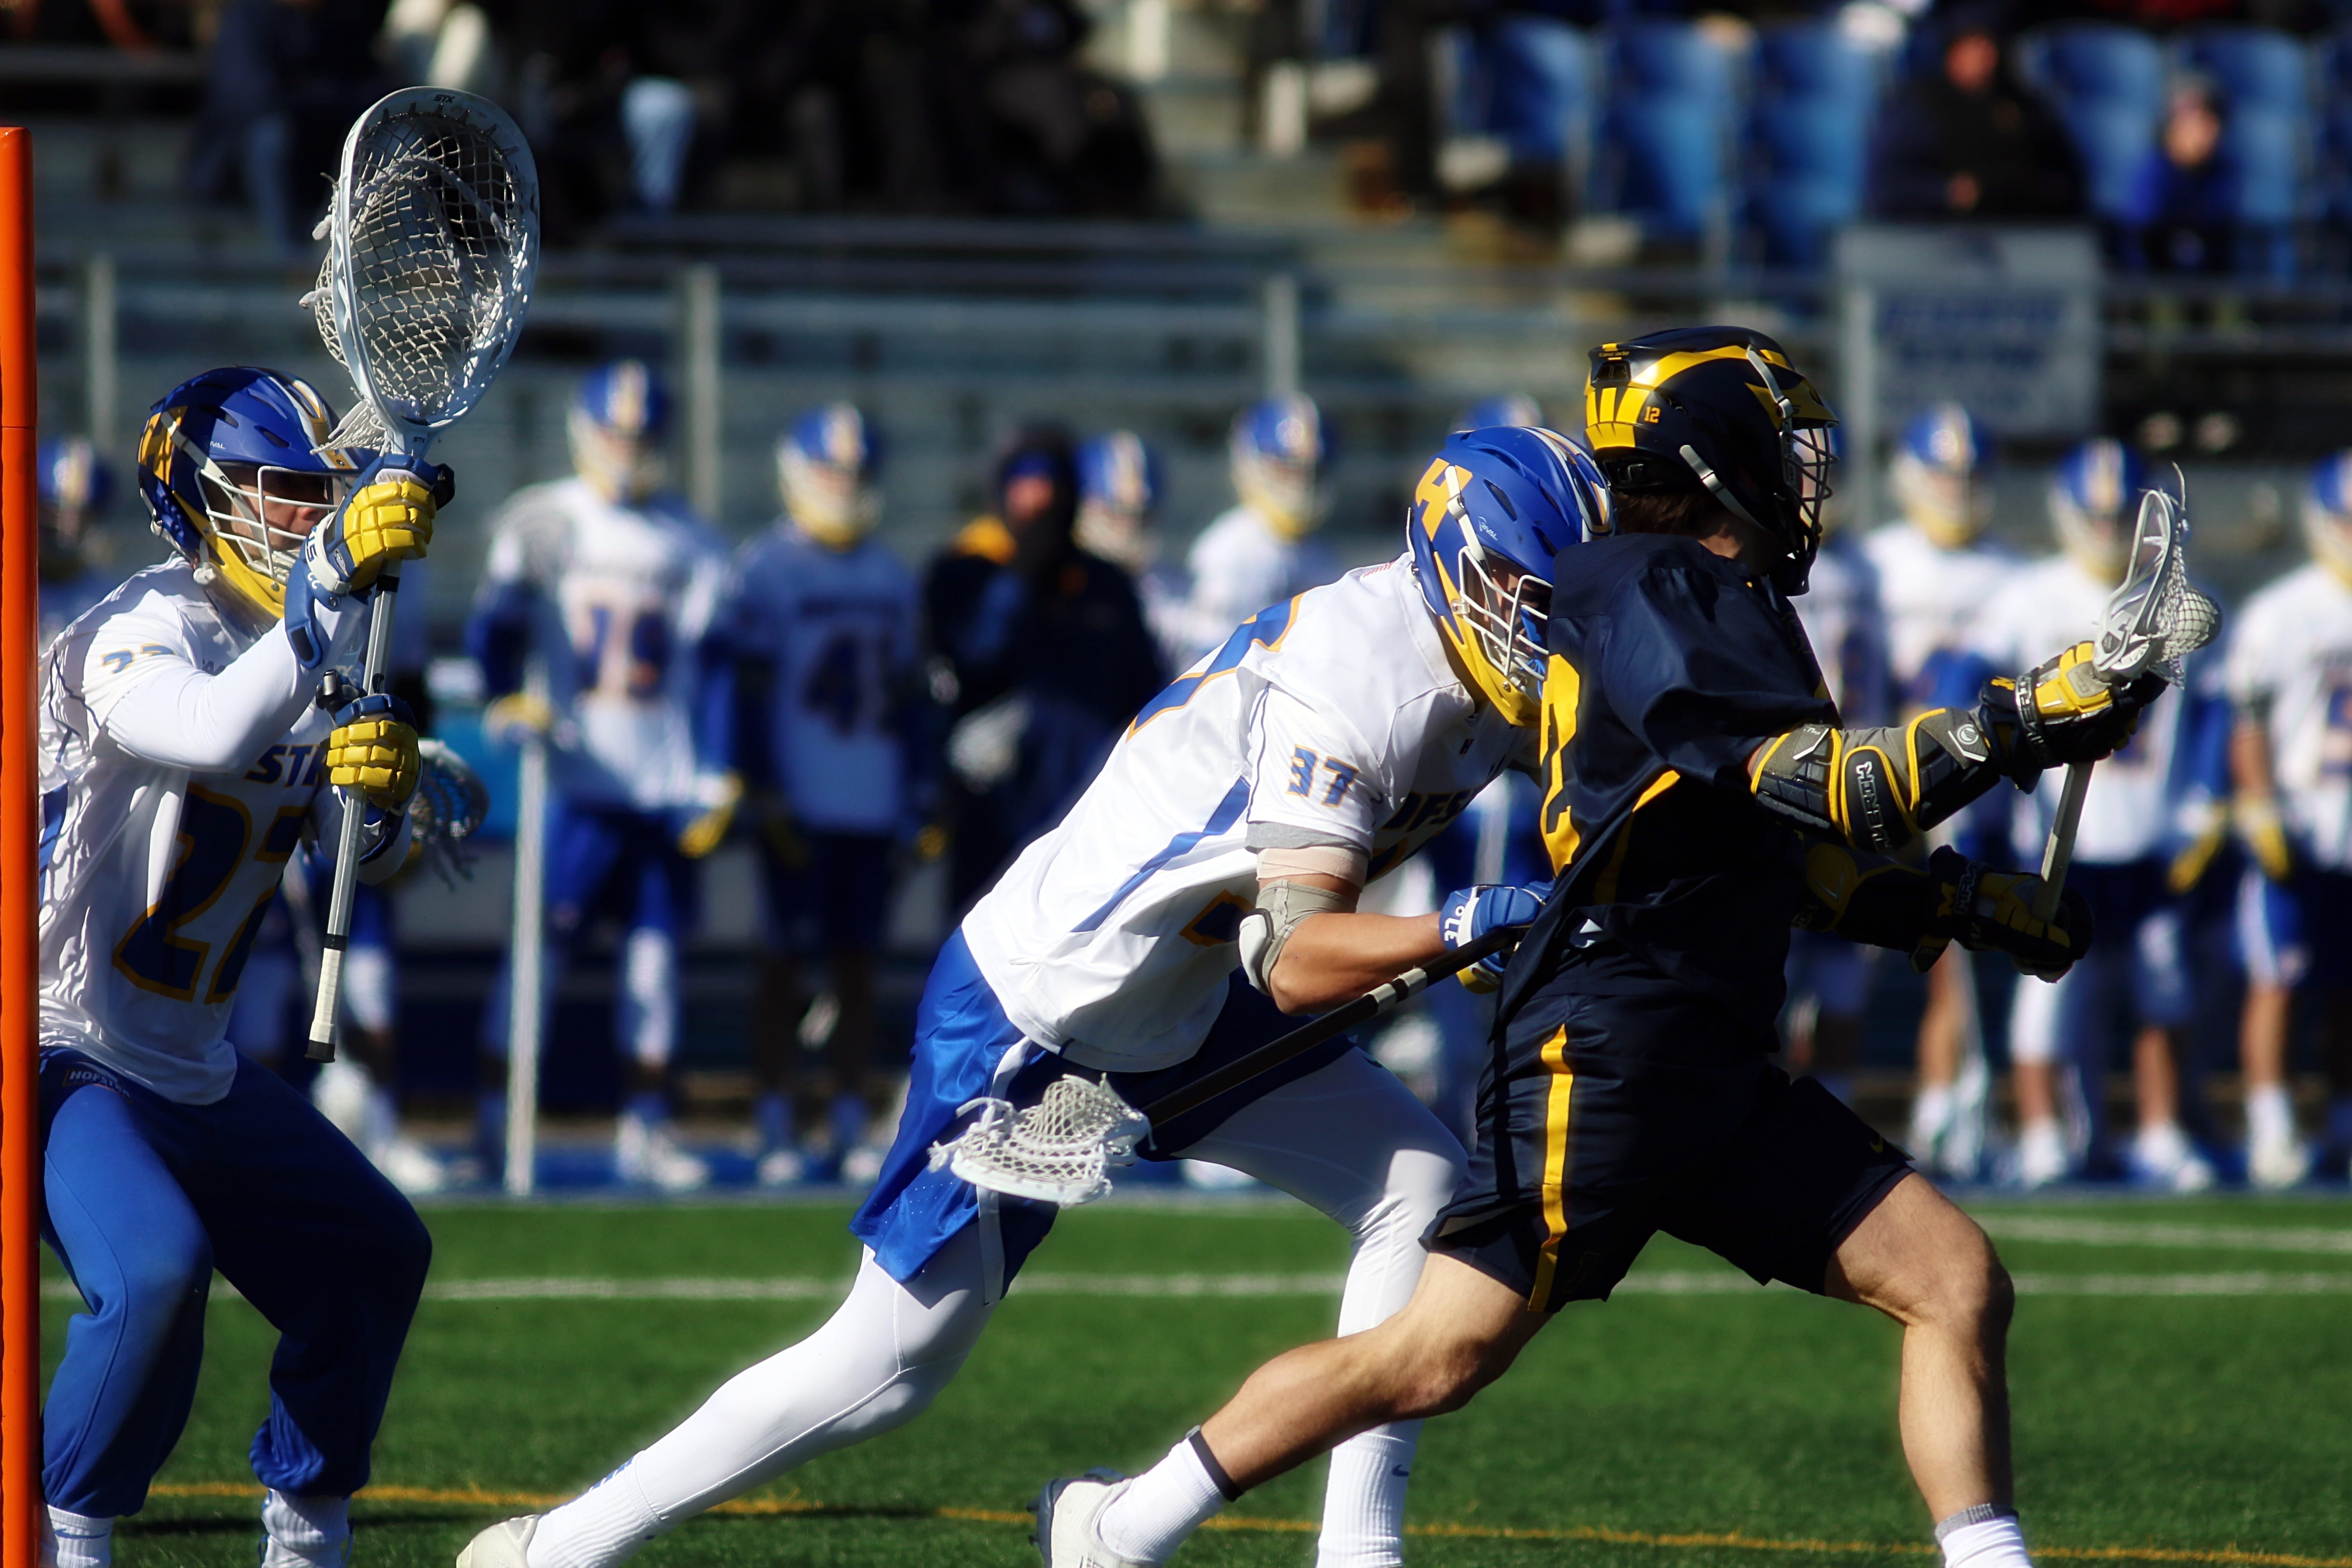 hofstra university university of michigan lacrosse ncaa d1 college lacrosse photo jeff melnik